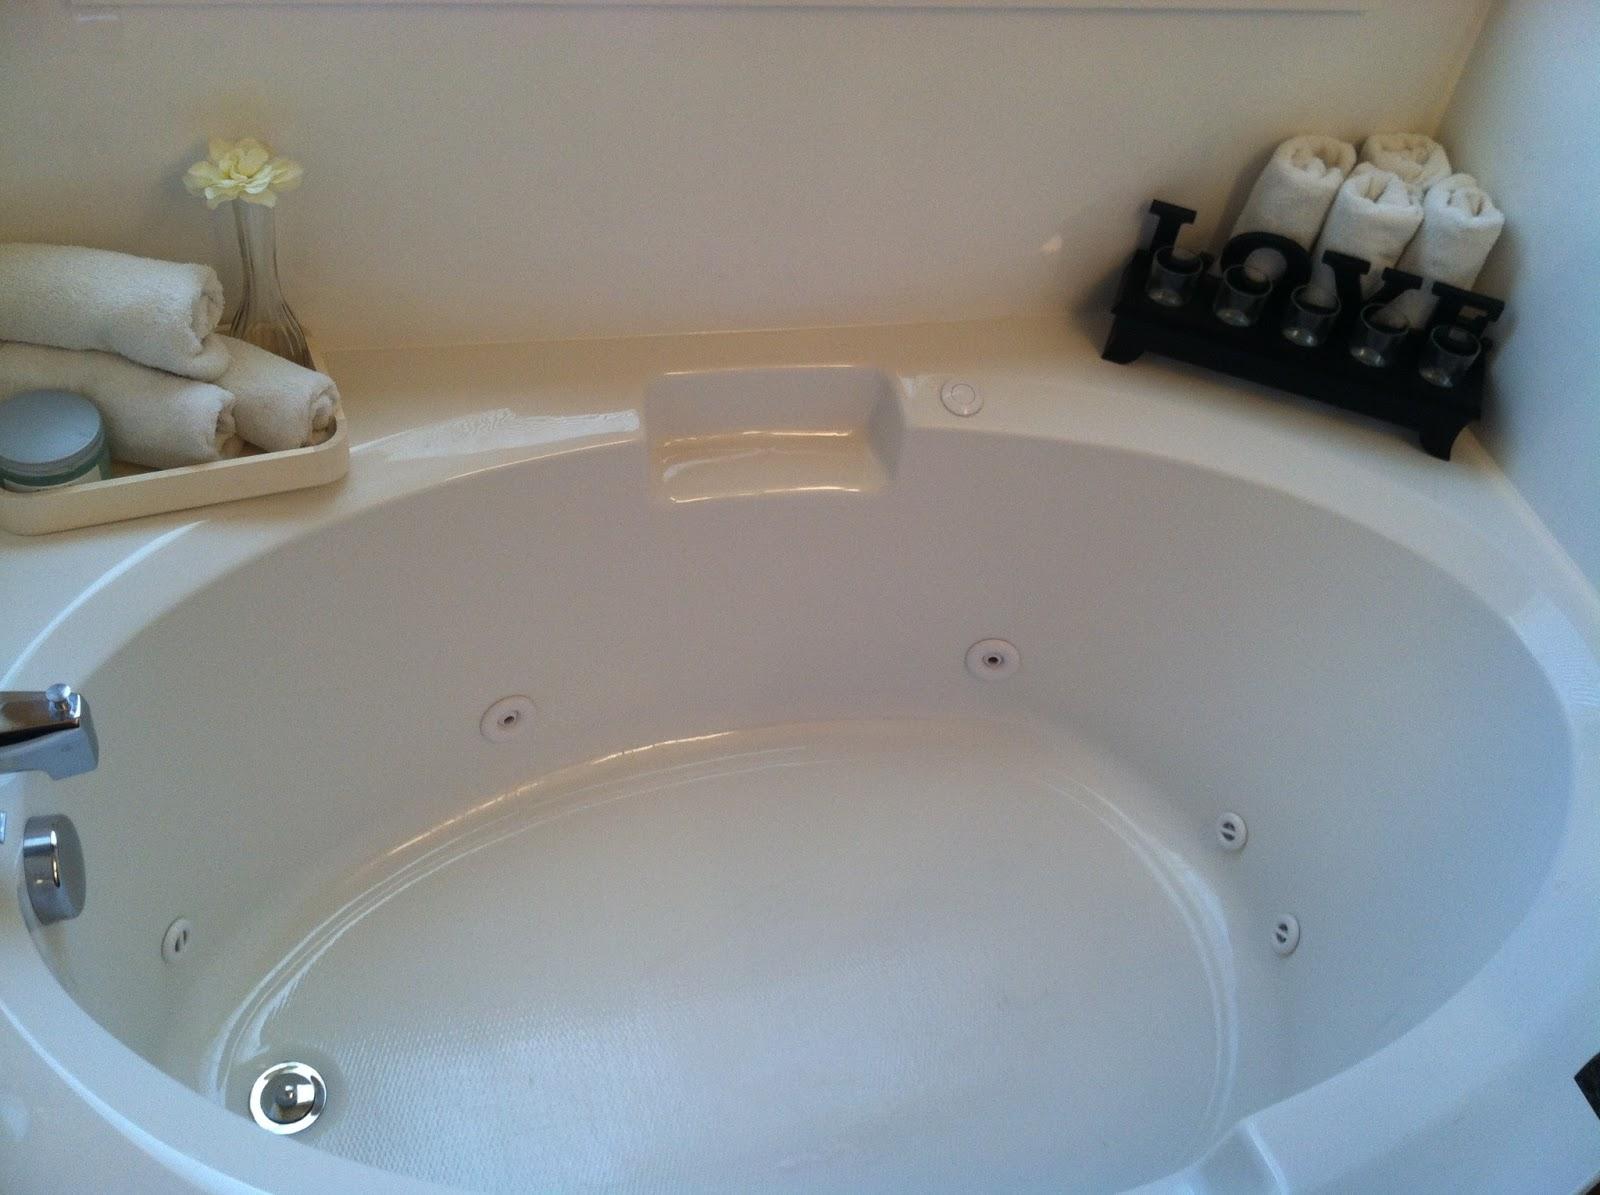 Jetted Bathtub Cleaner Bathroom 14 How To Clean Your Kitchen Cabinets Under Kitchen Sink Pu